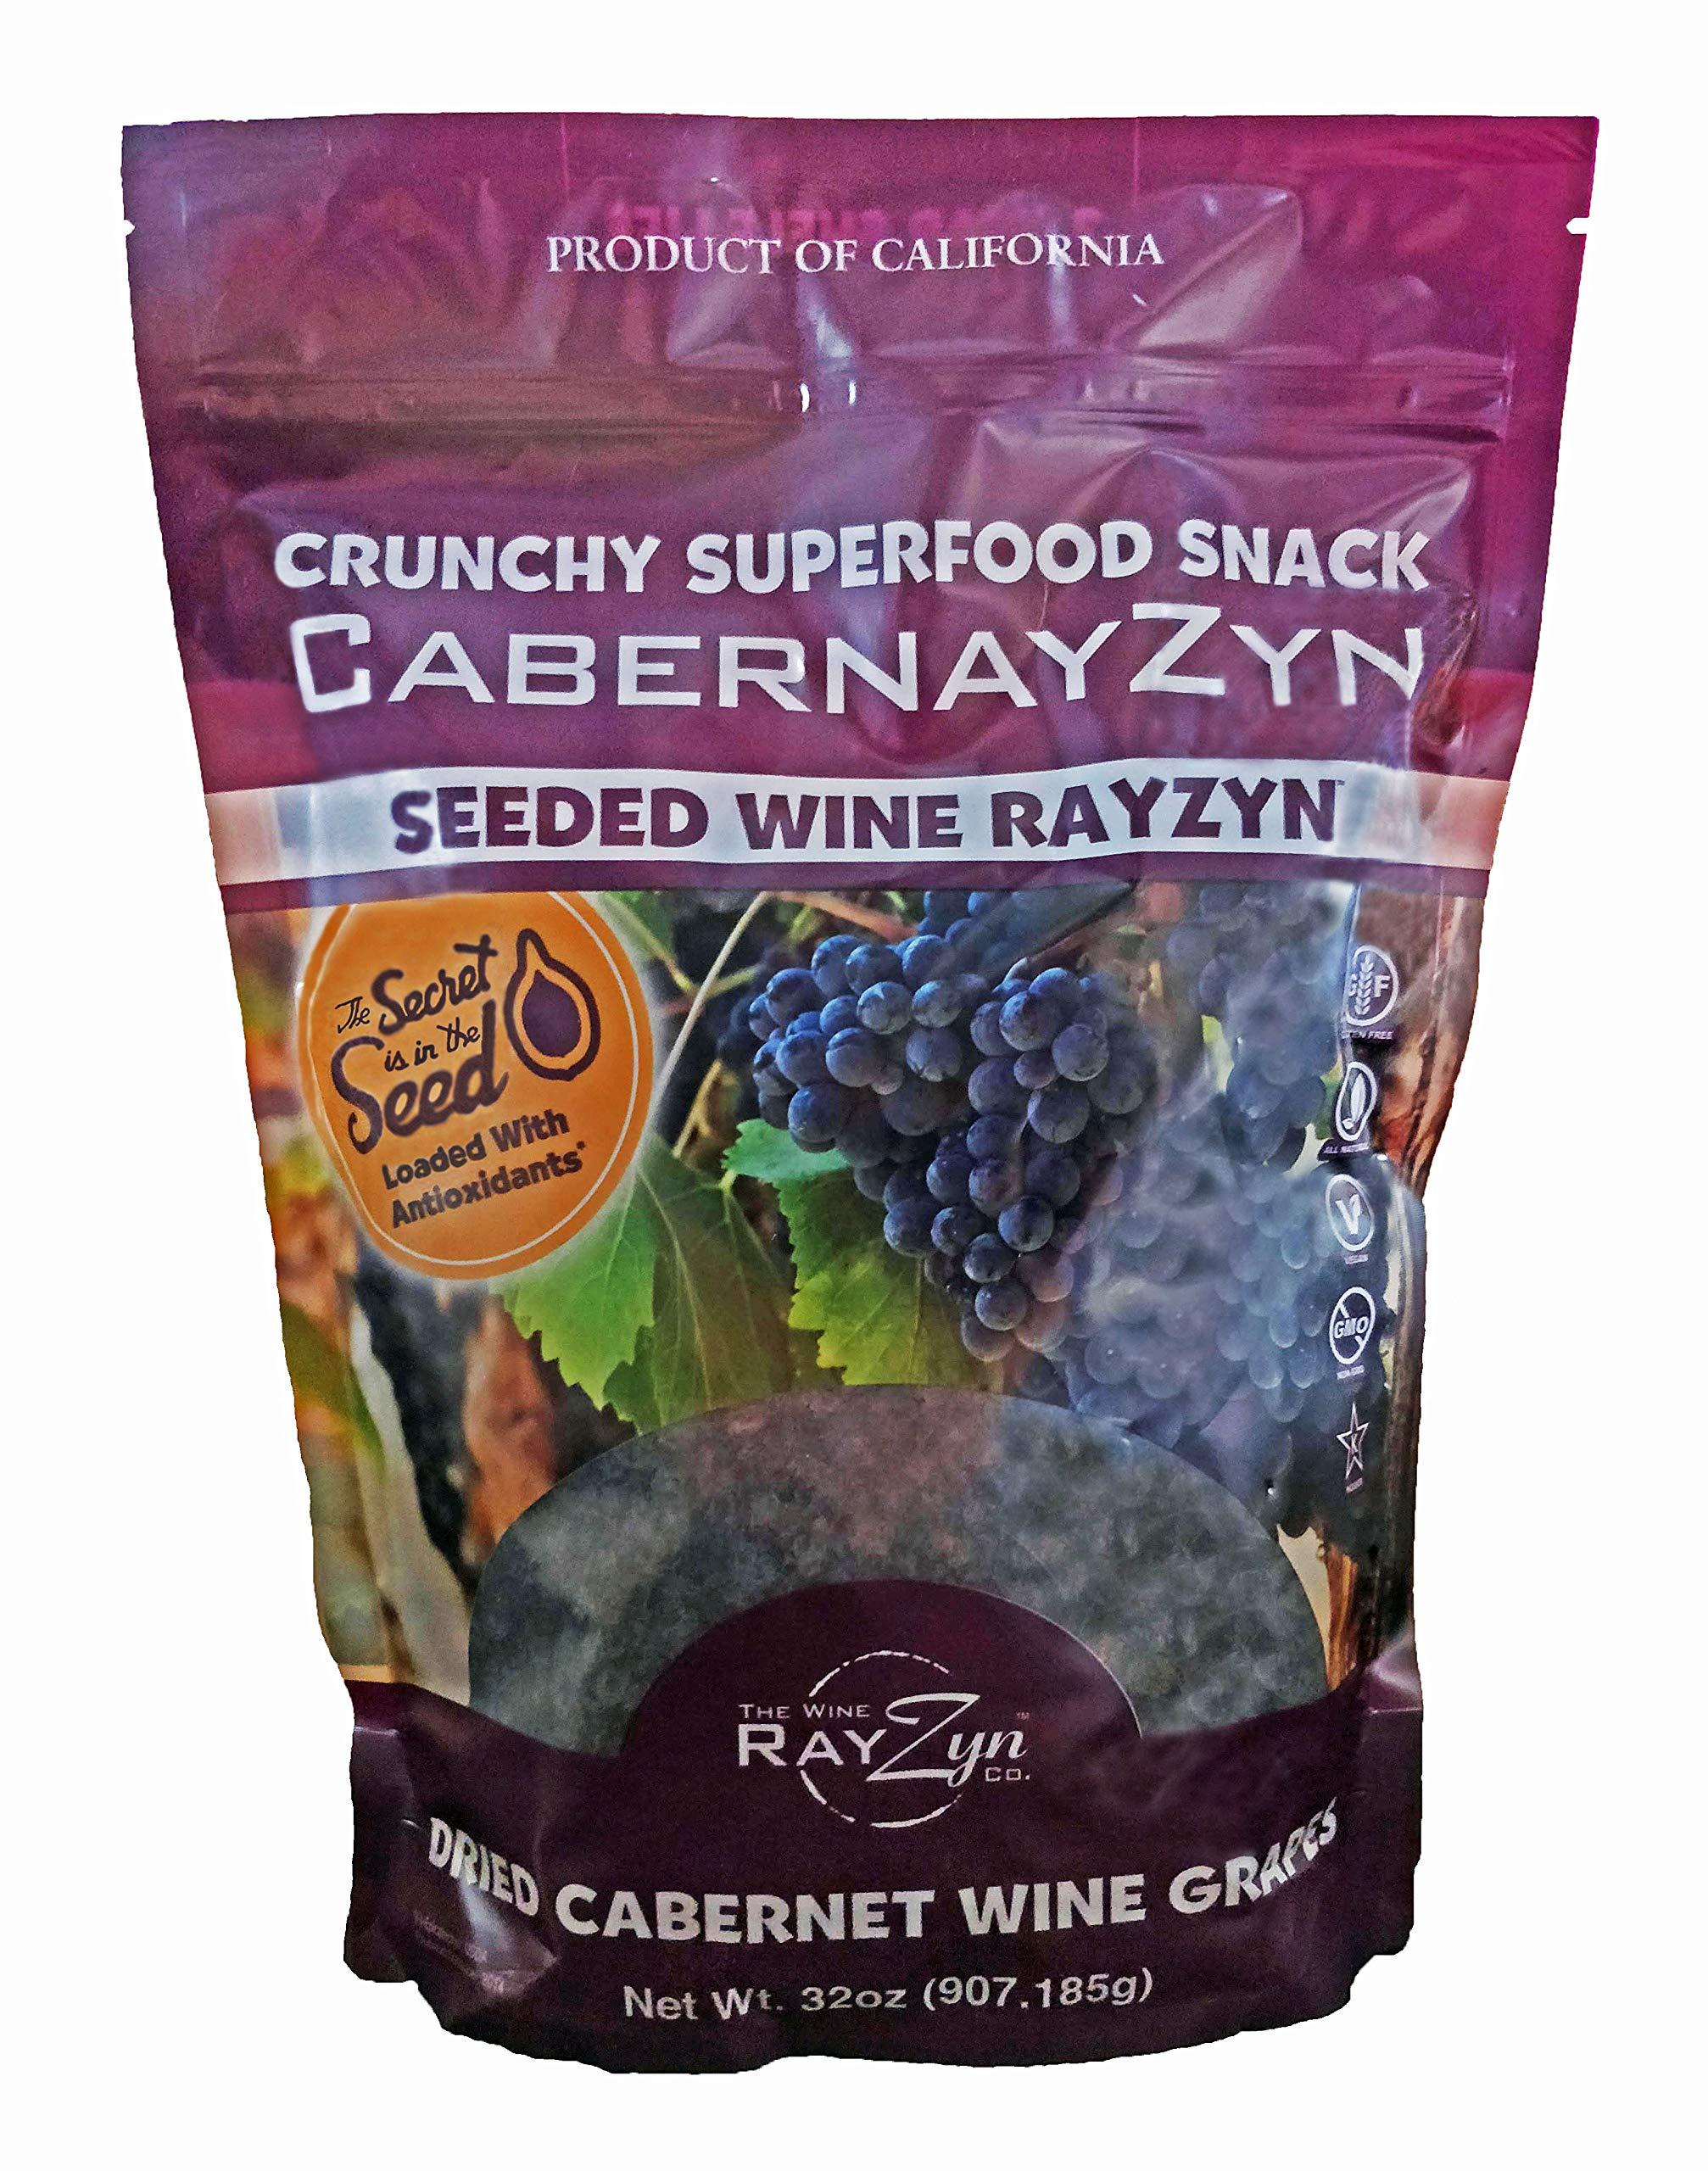 CabernayZyn Dried Cabernet Sauvignon Seeded Wine Grape RayZyn (Raisin) 2 Pounds